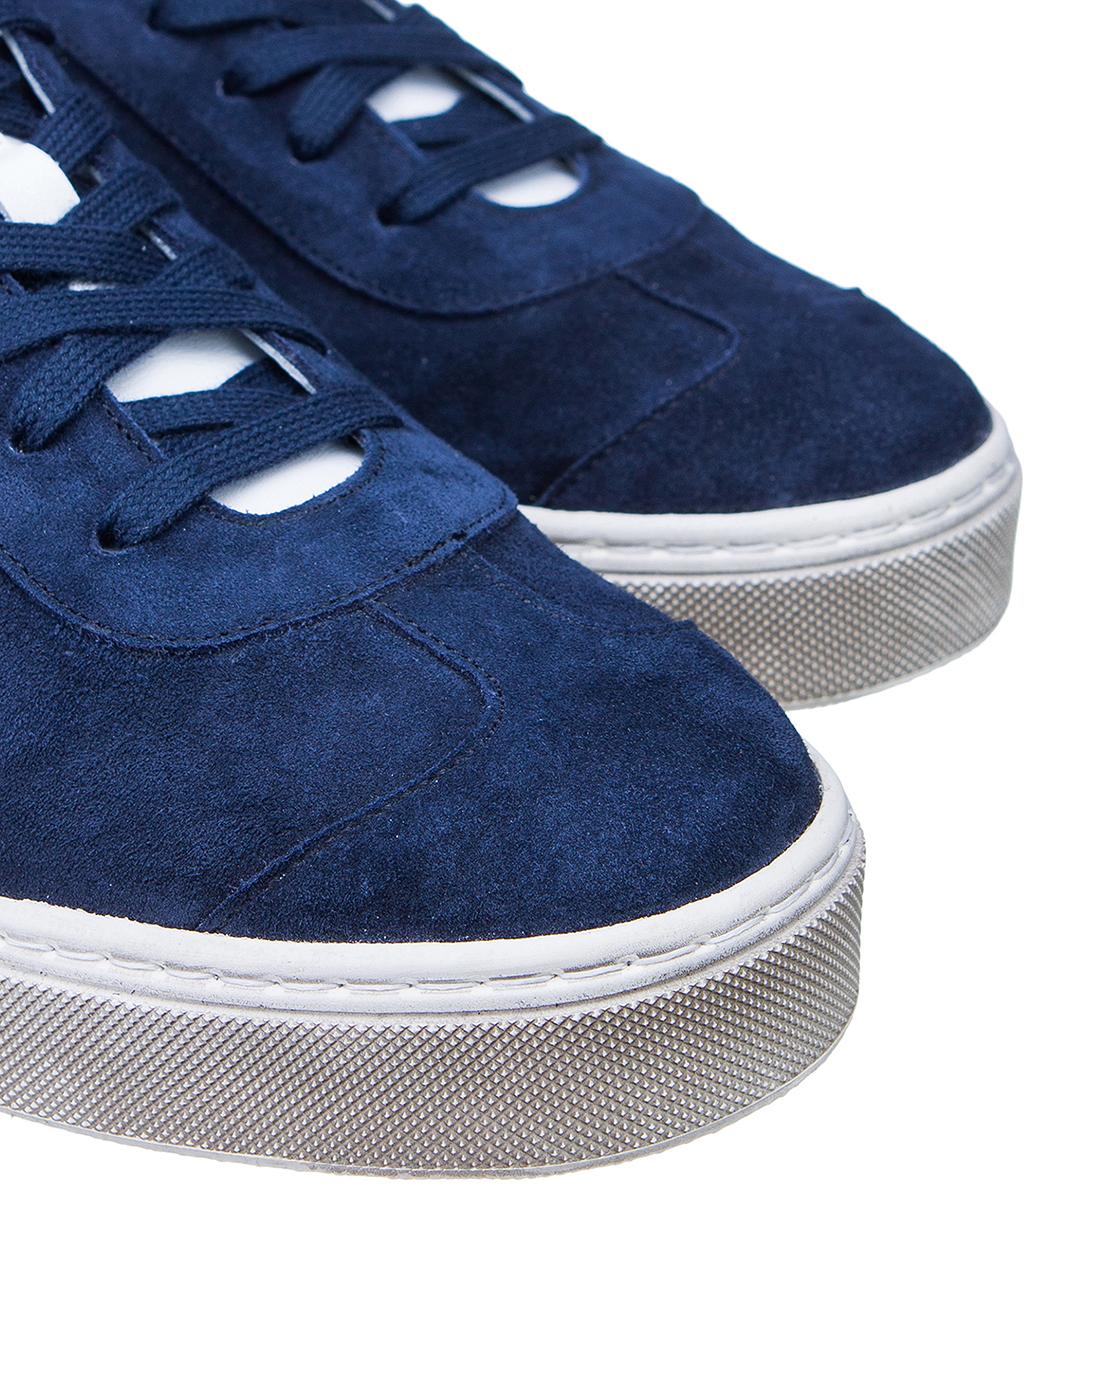 Кеды синие мужские  Pellettieri Di Parma S515060.247.152-4